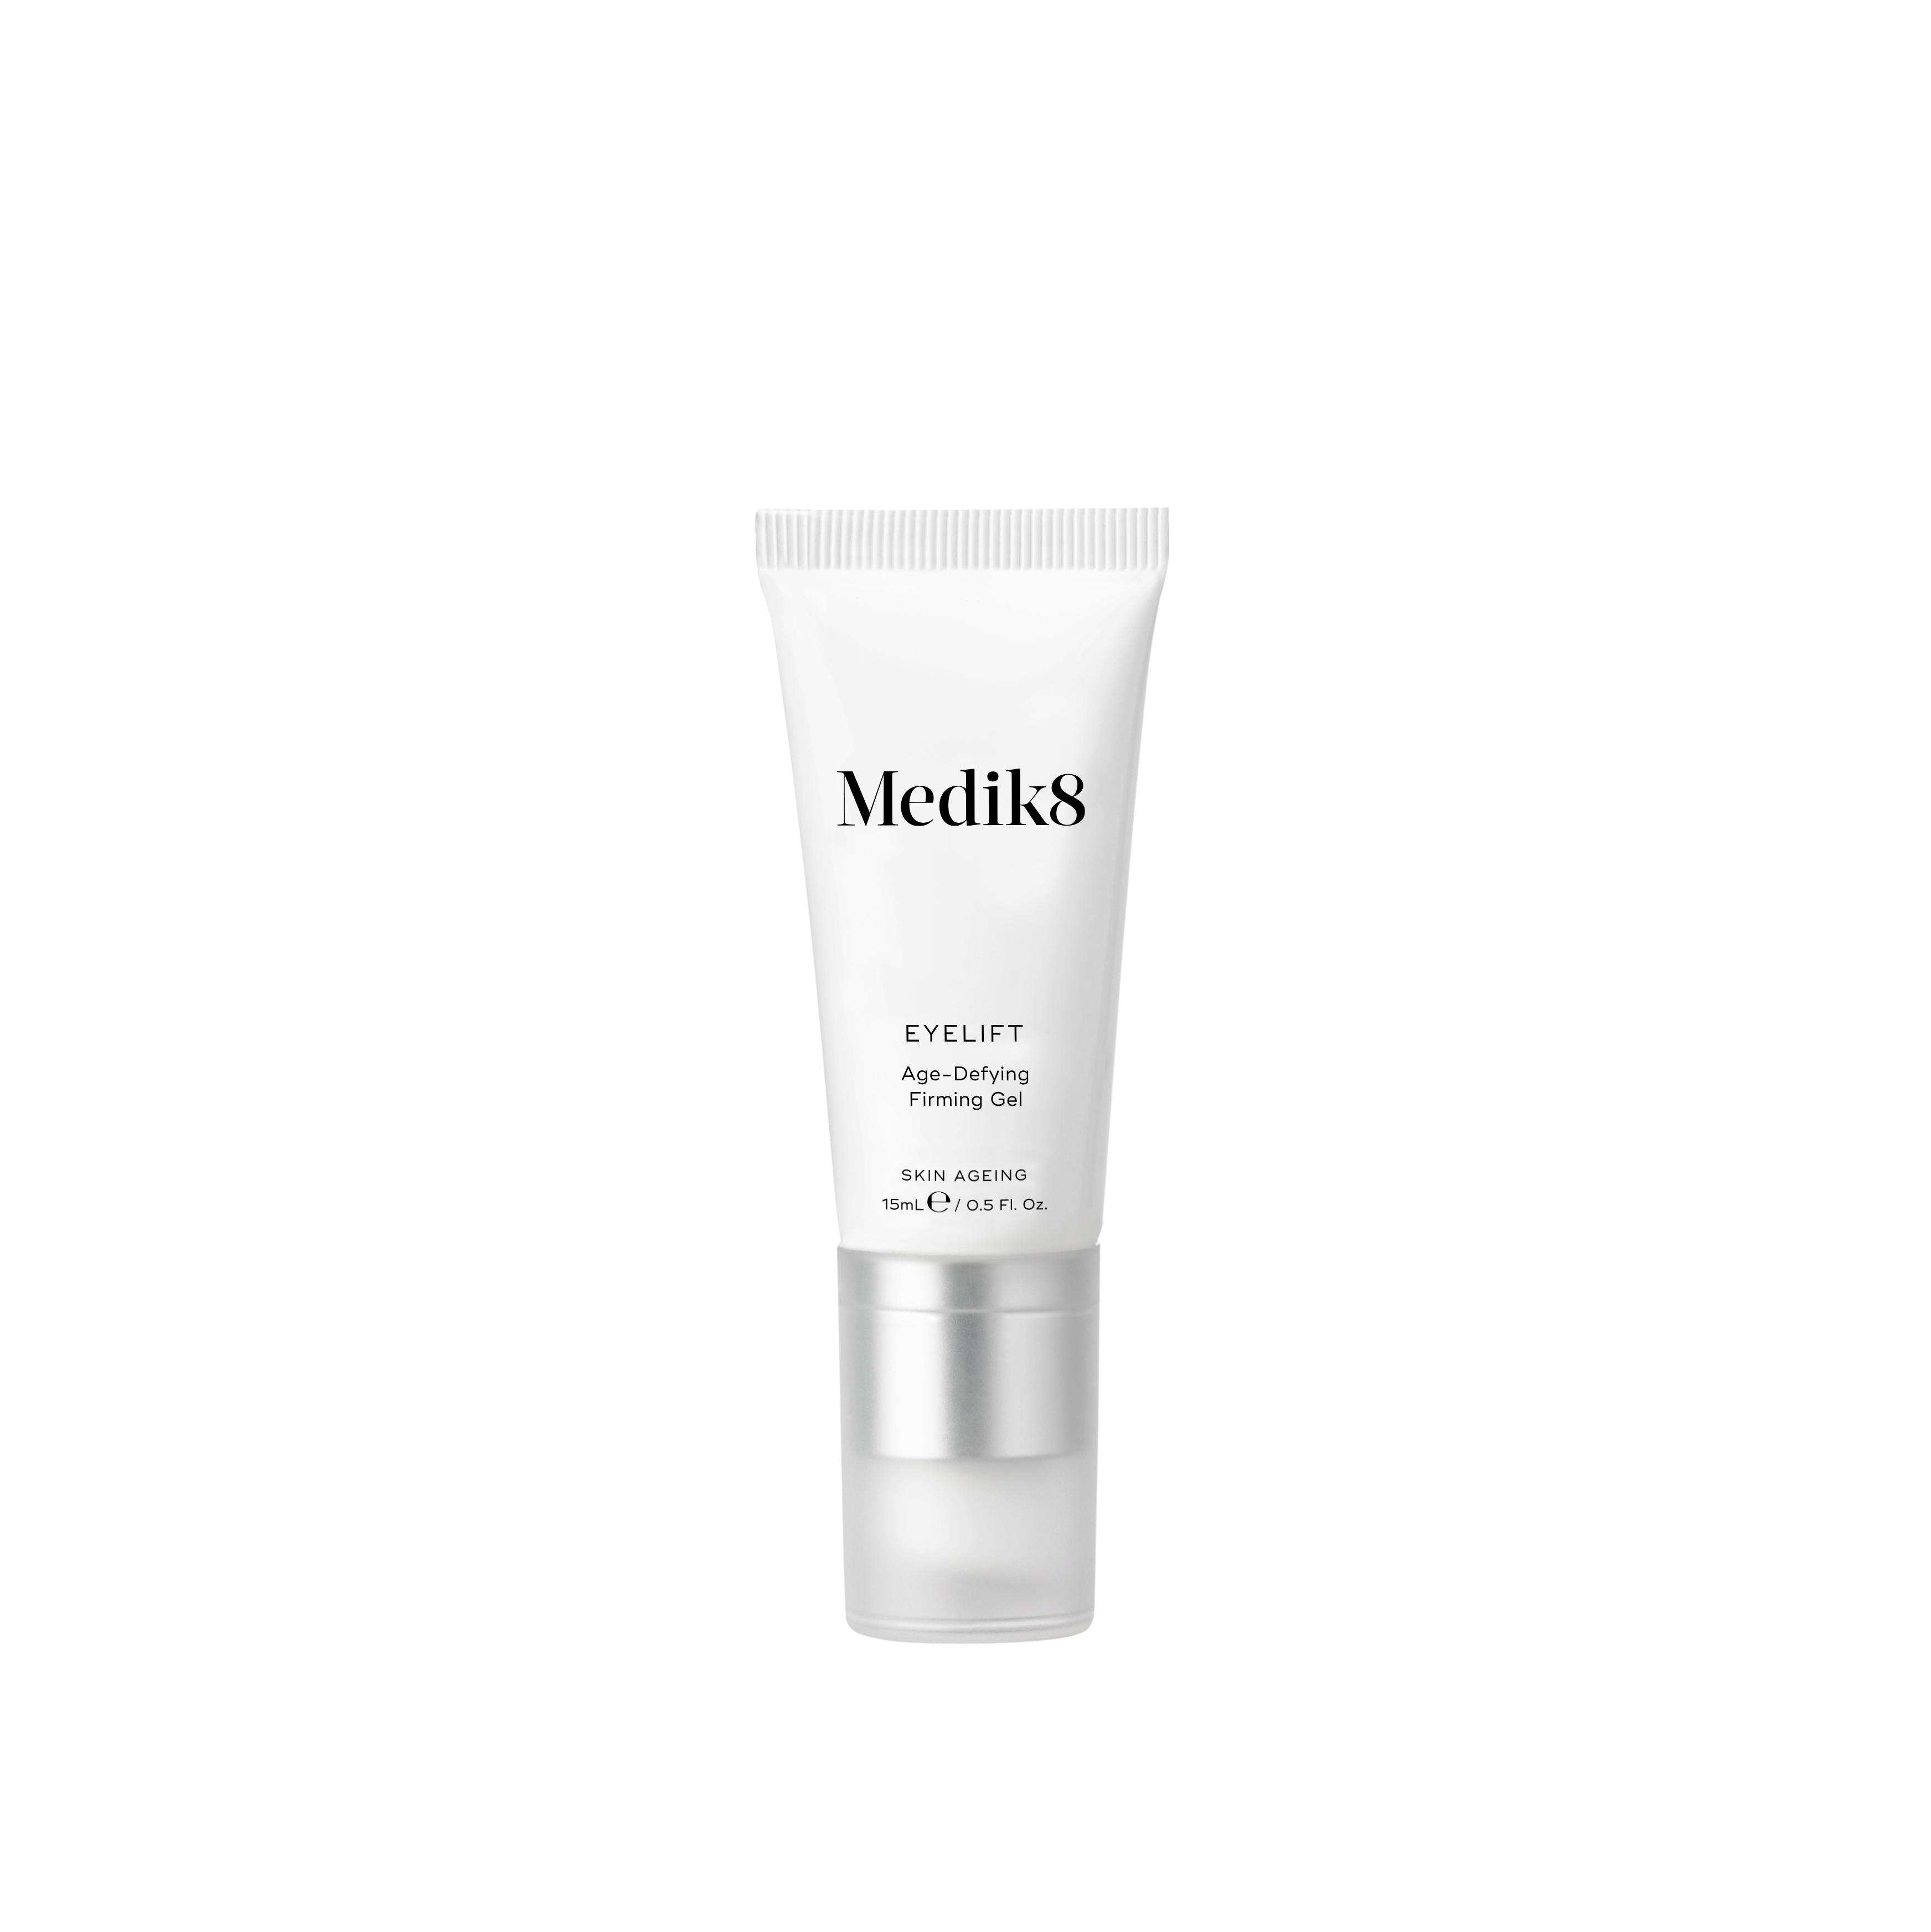 Medik8 eyelift peptide firming gel